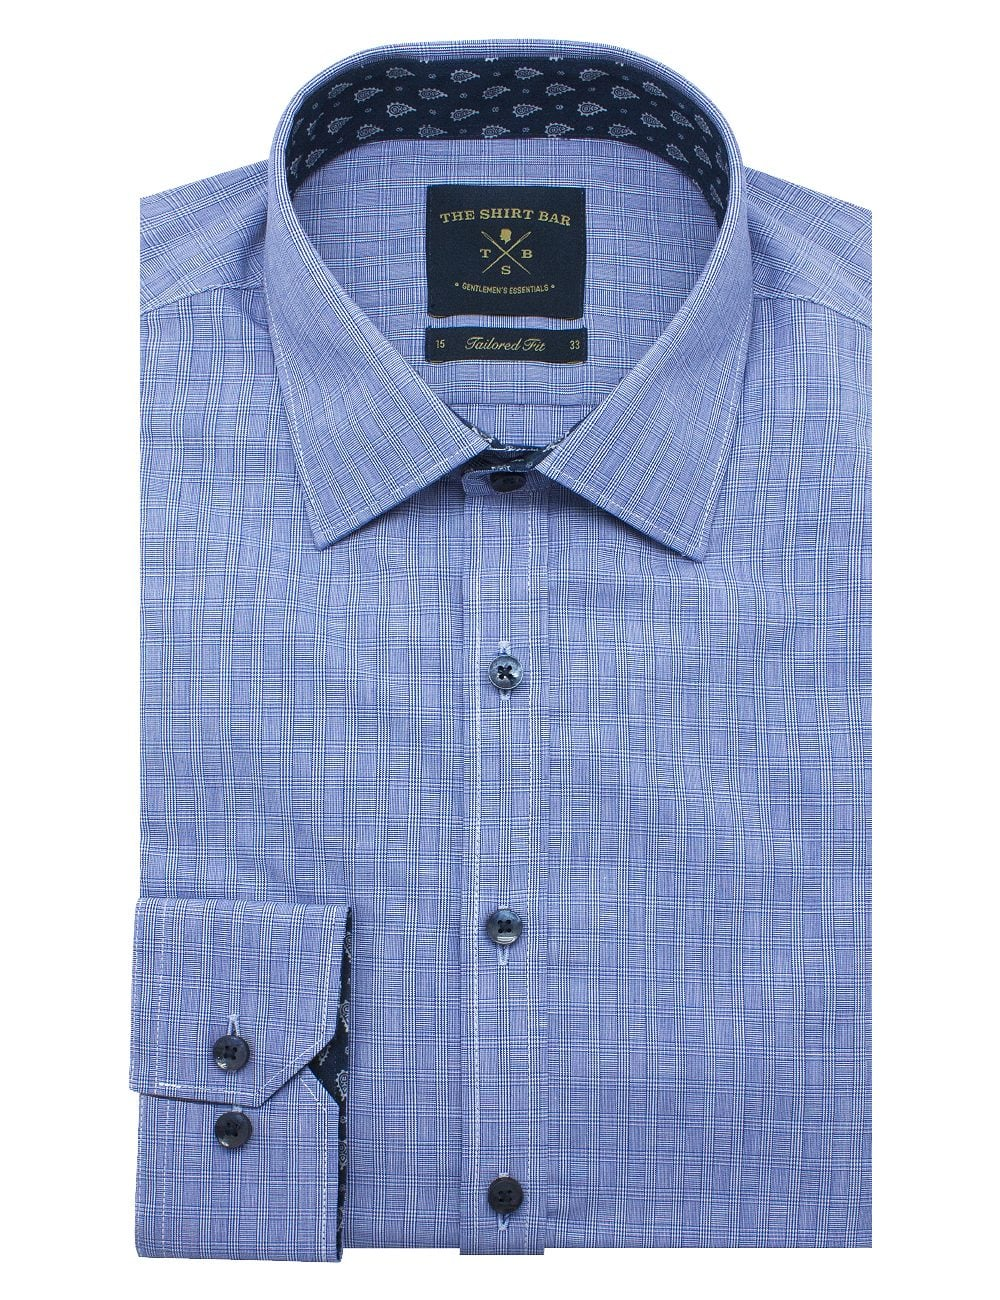 Blue Checks Spill Resist Slim / Tailored Fit Long Sleeve Shirt - TF2A11.11